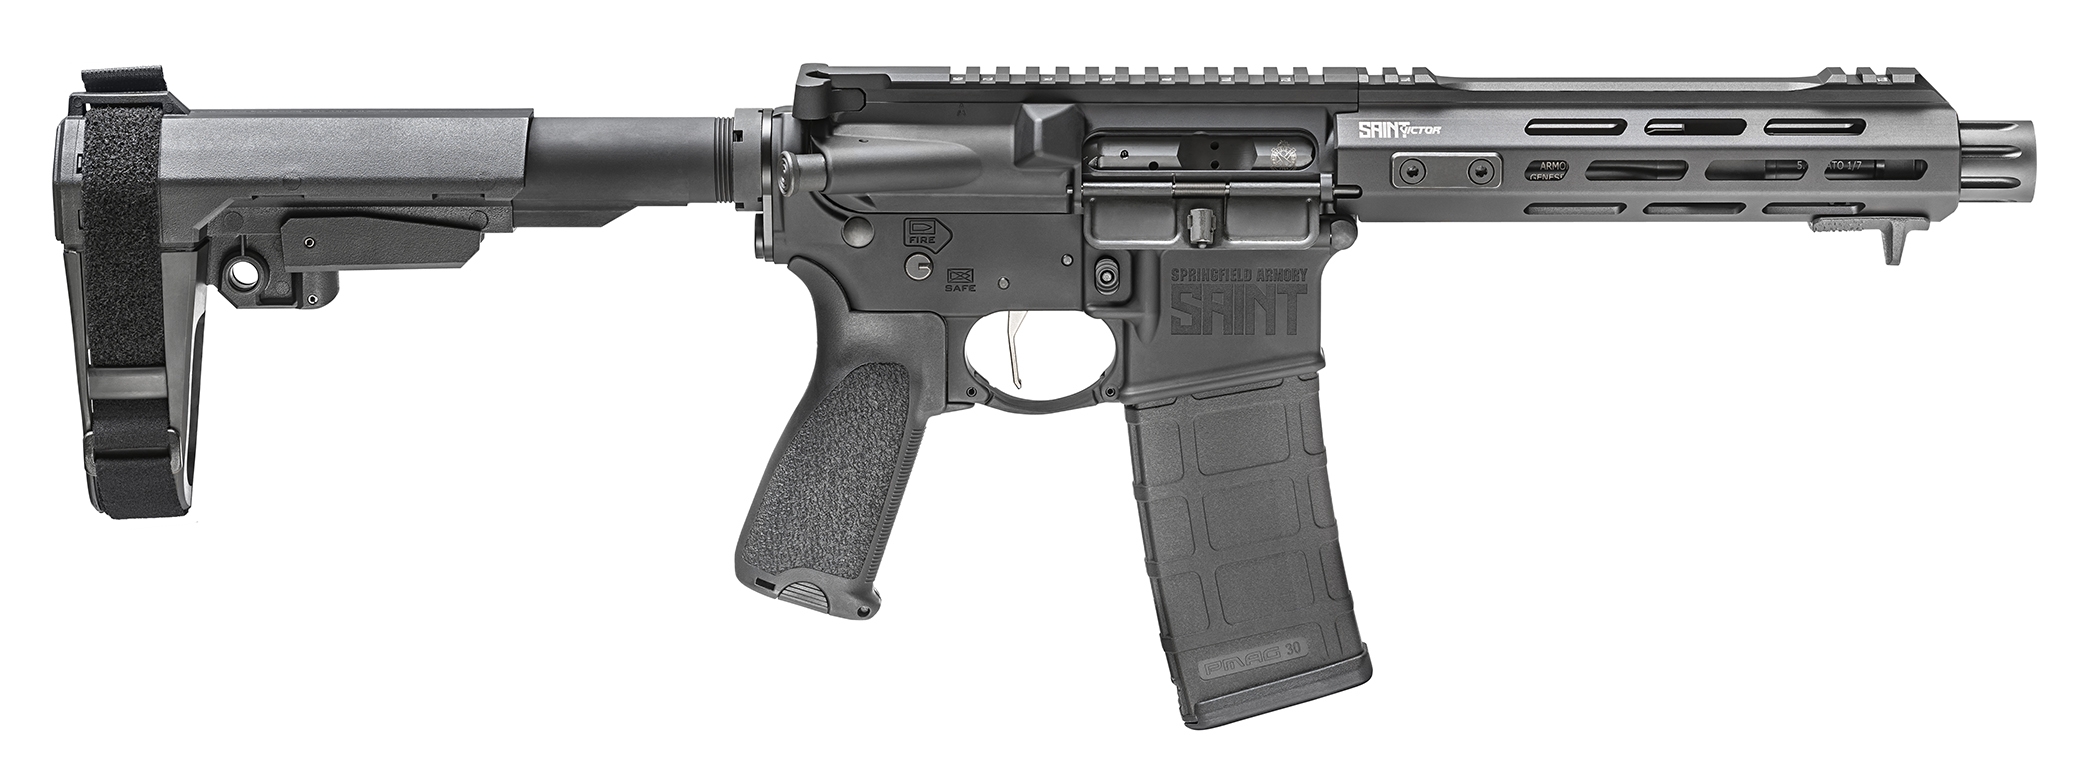 Springfield Armory Saint Victor Pistol 223 Rem   5.56 NATO